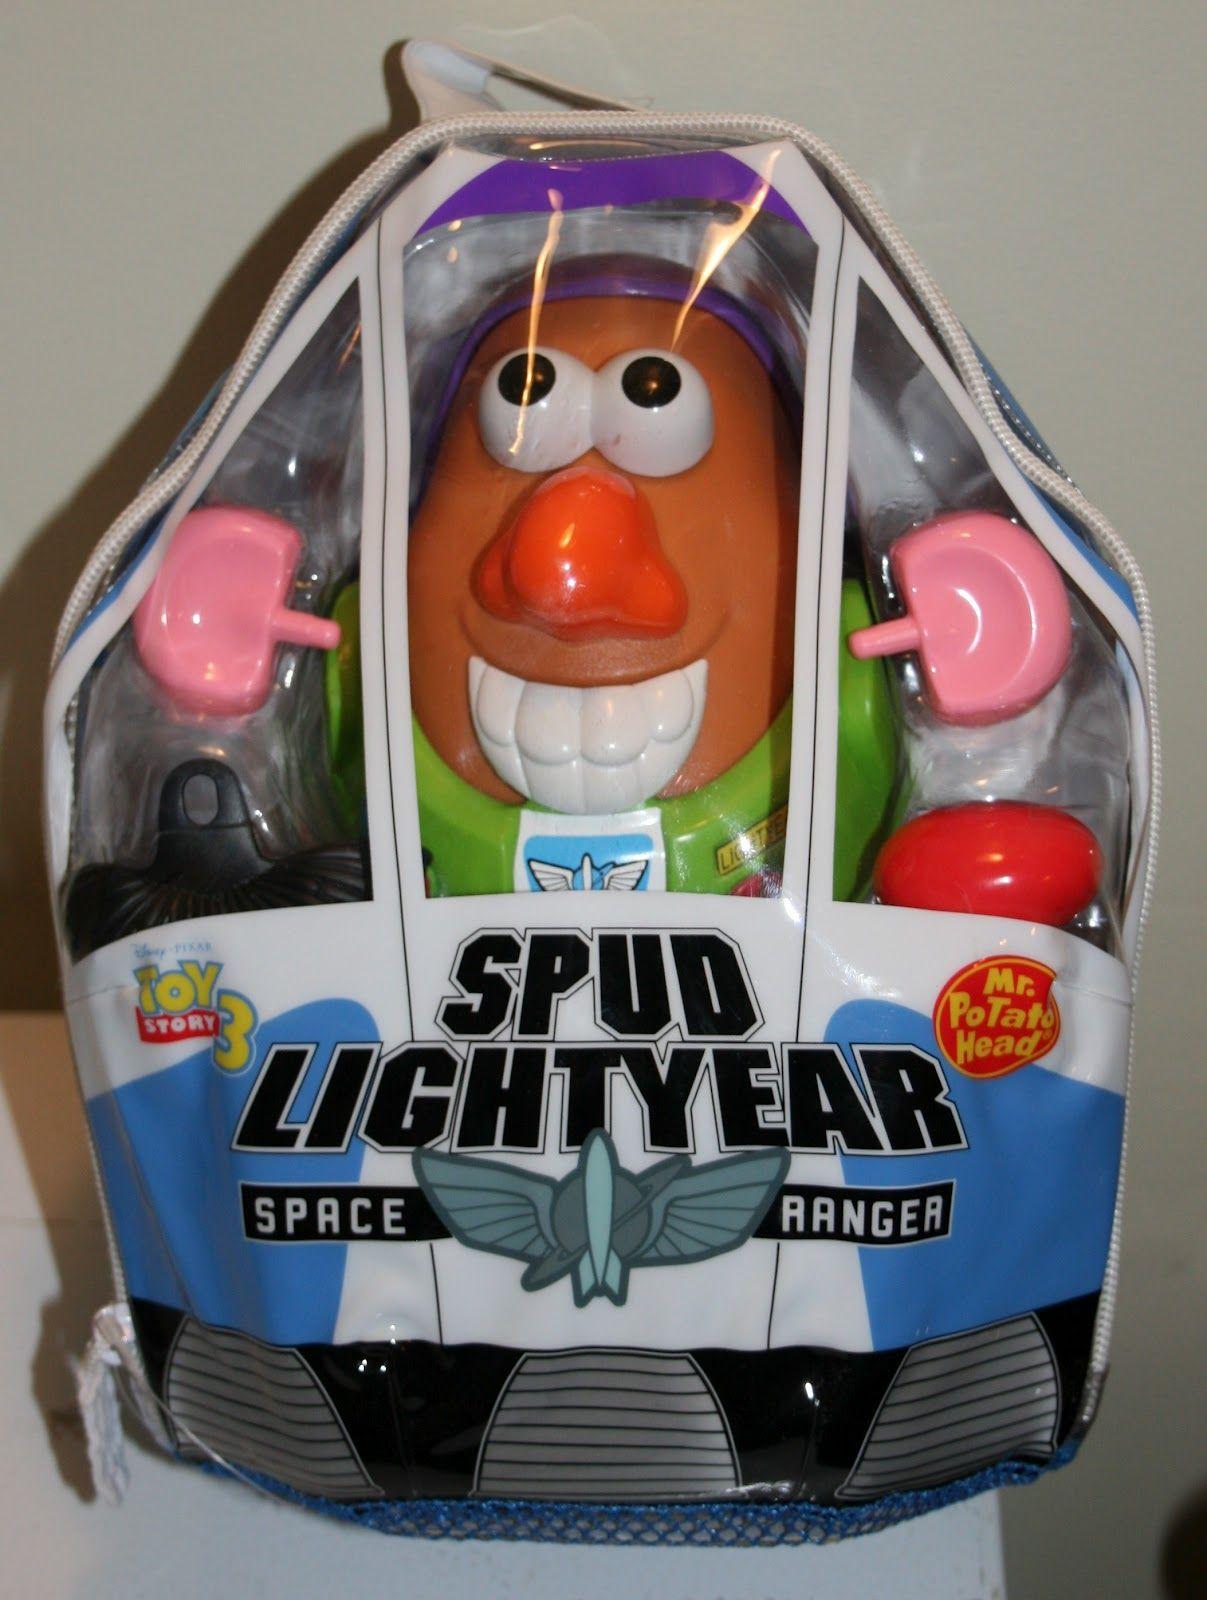 Spud Lightyear Random Potato Head Toys Disney